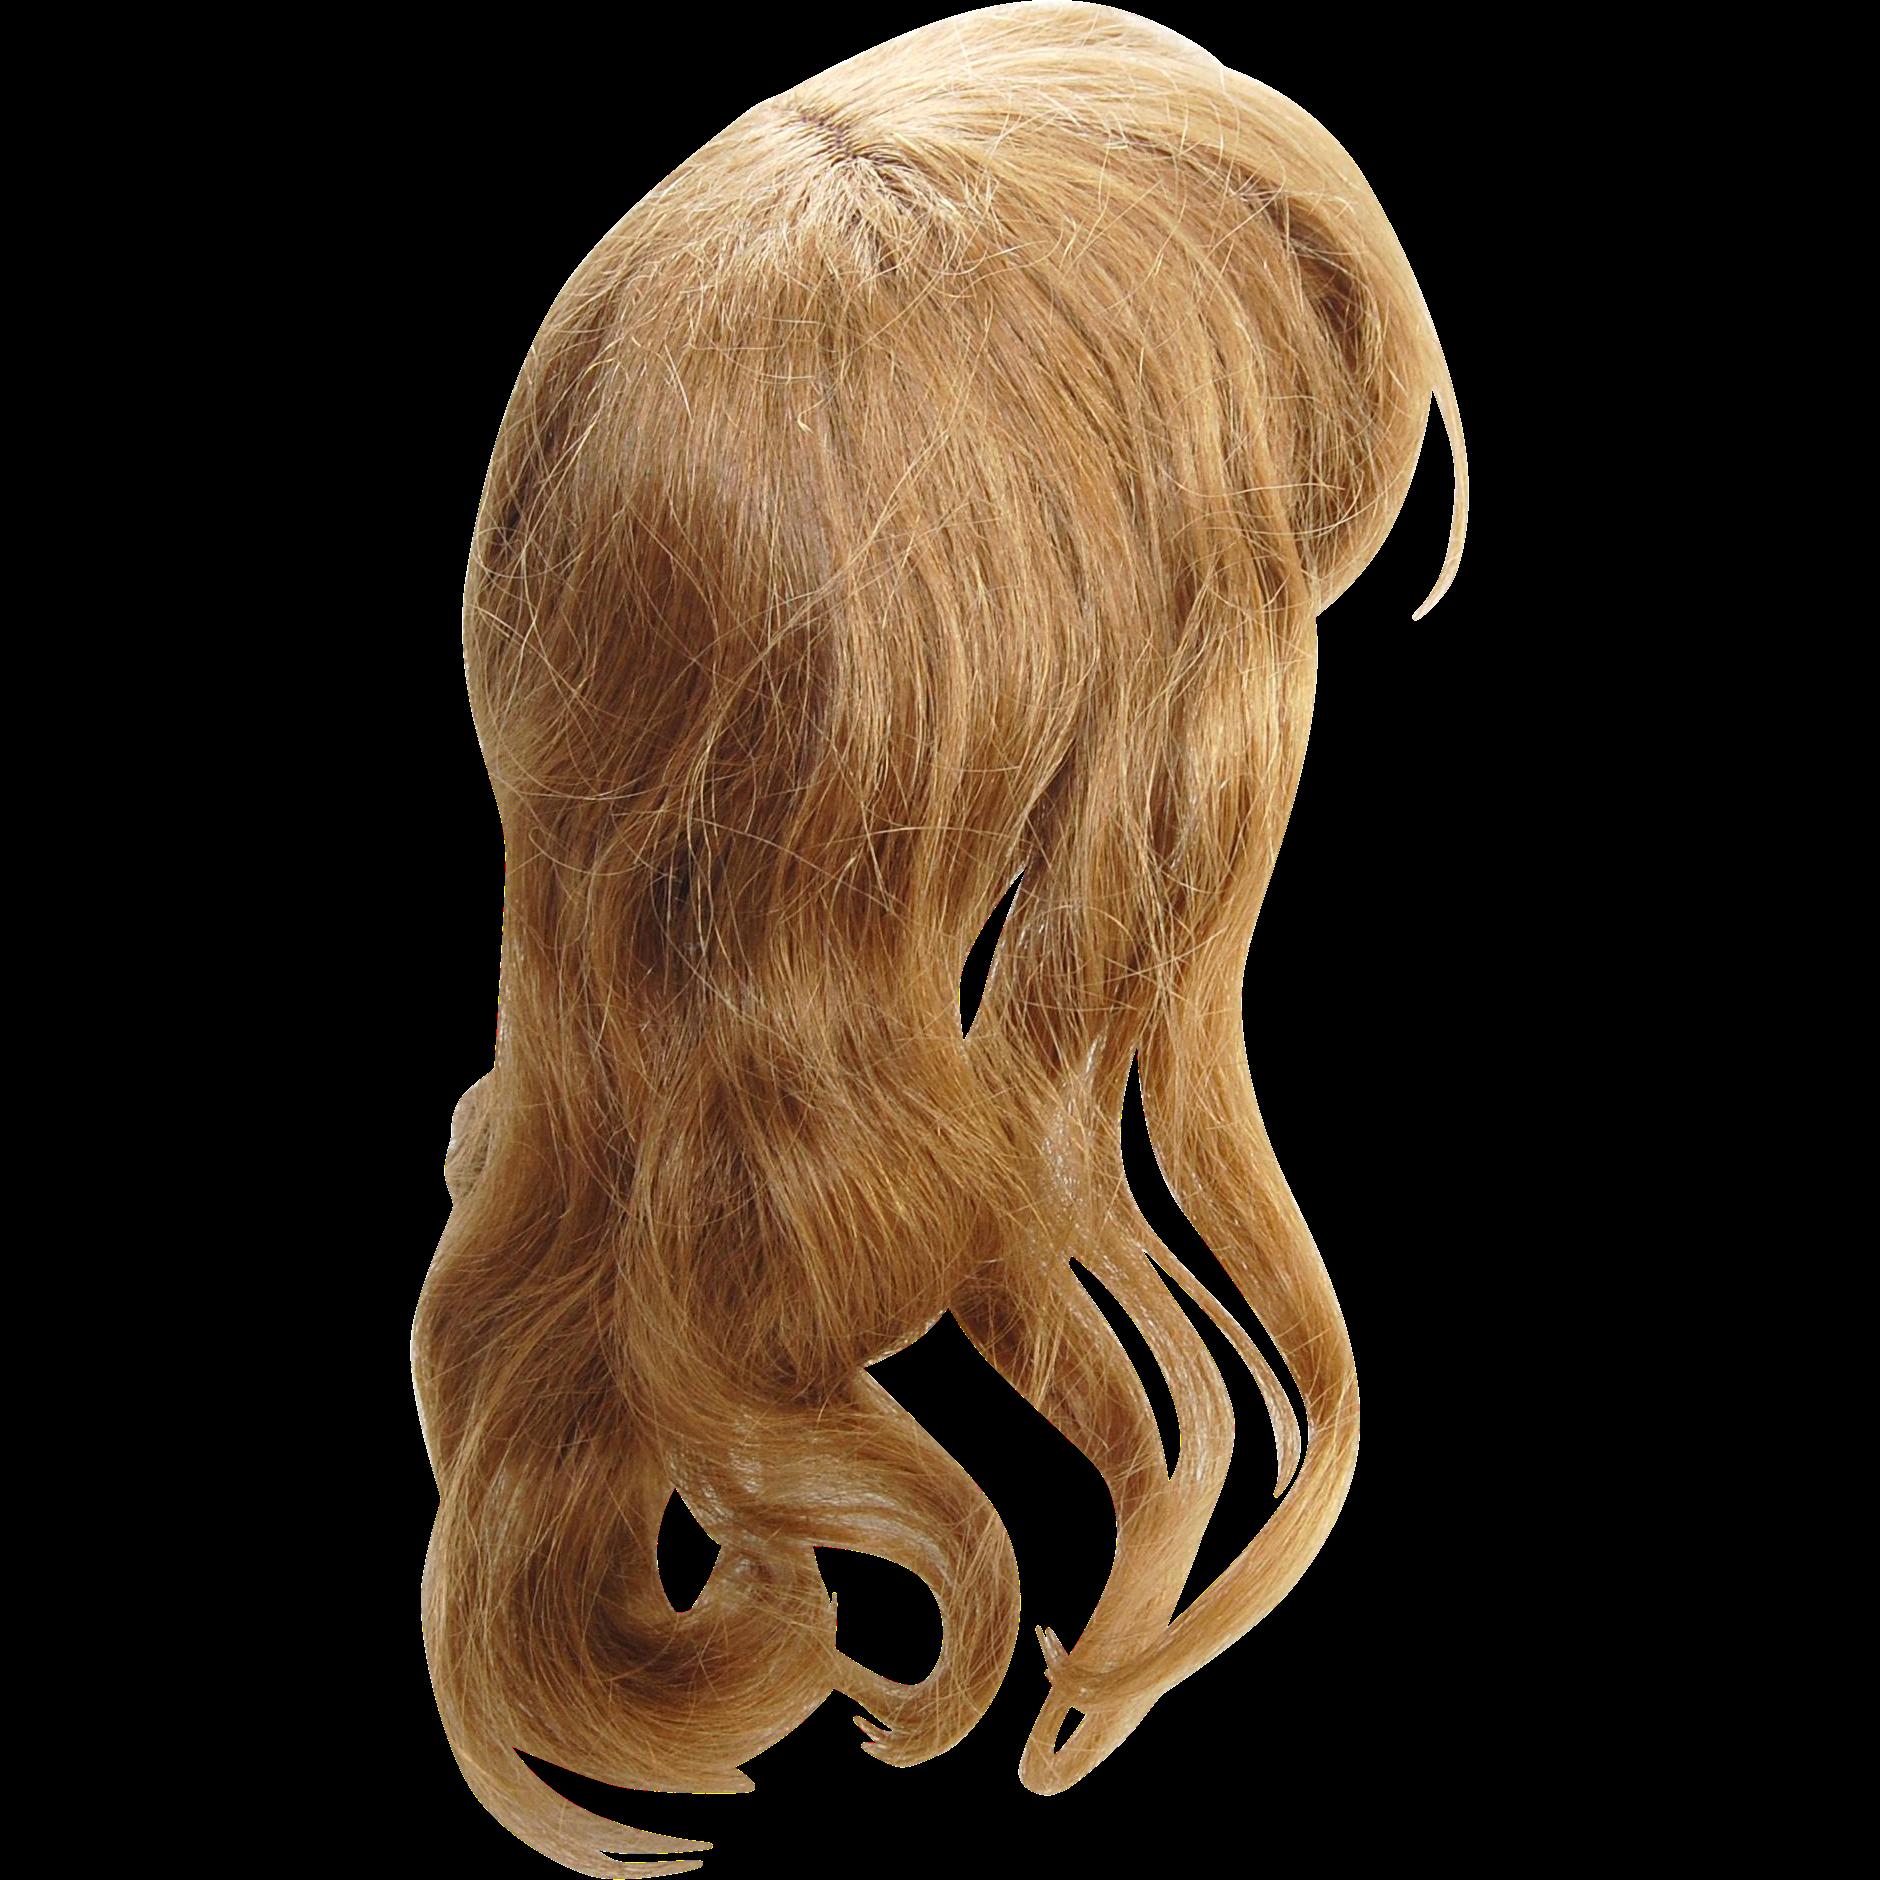 Doll Hair Human Wig 93